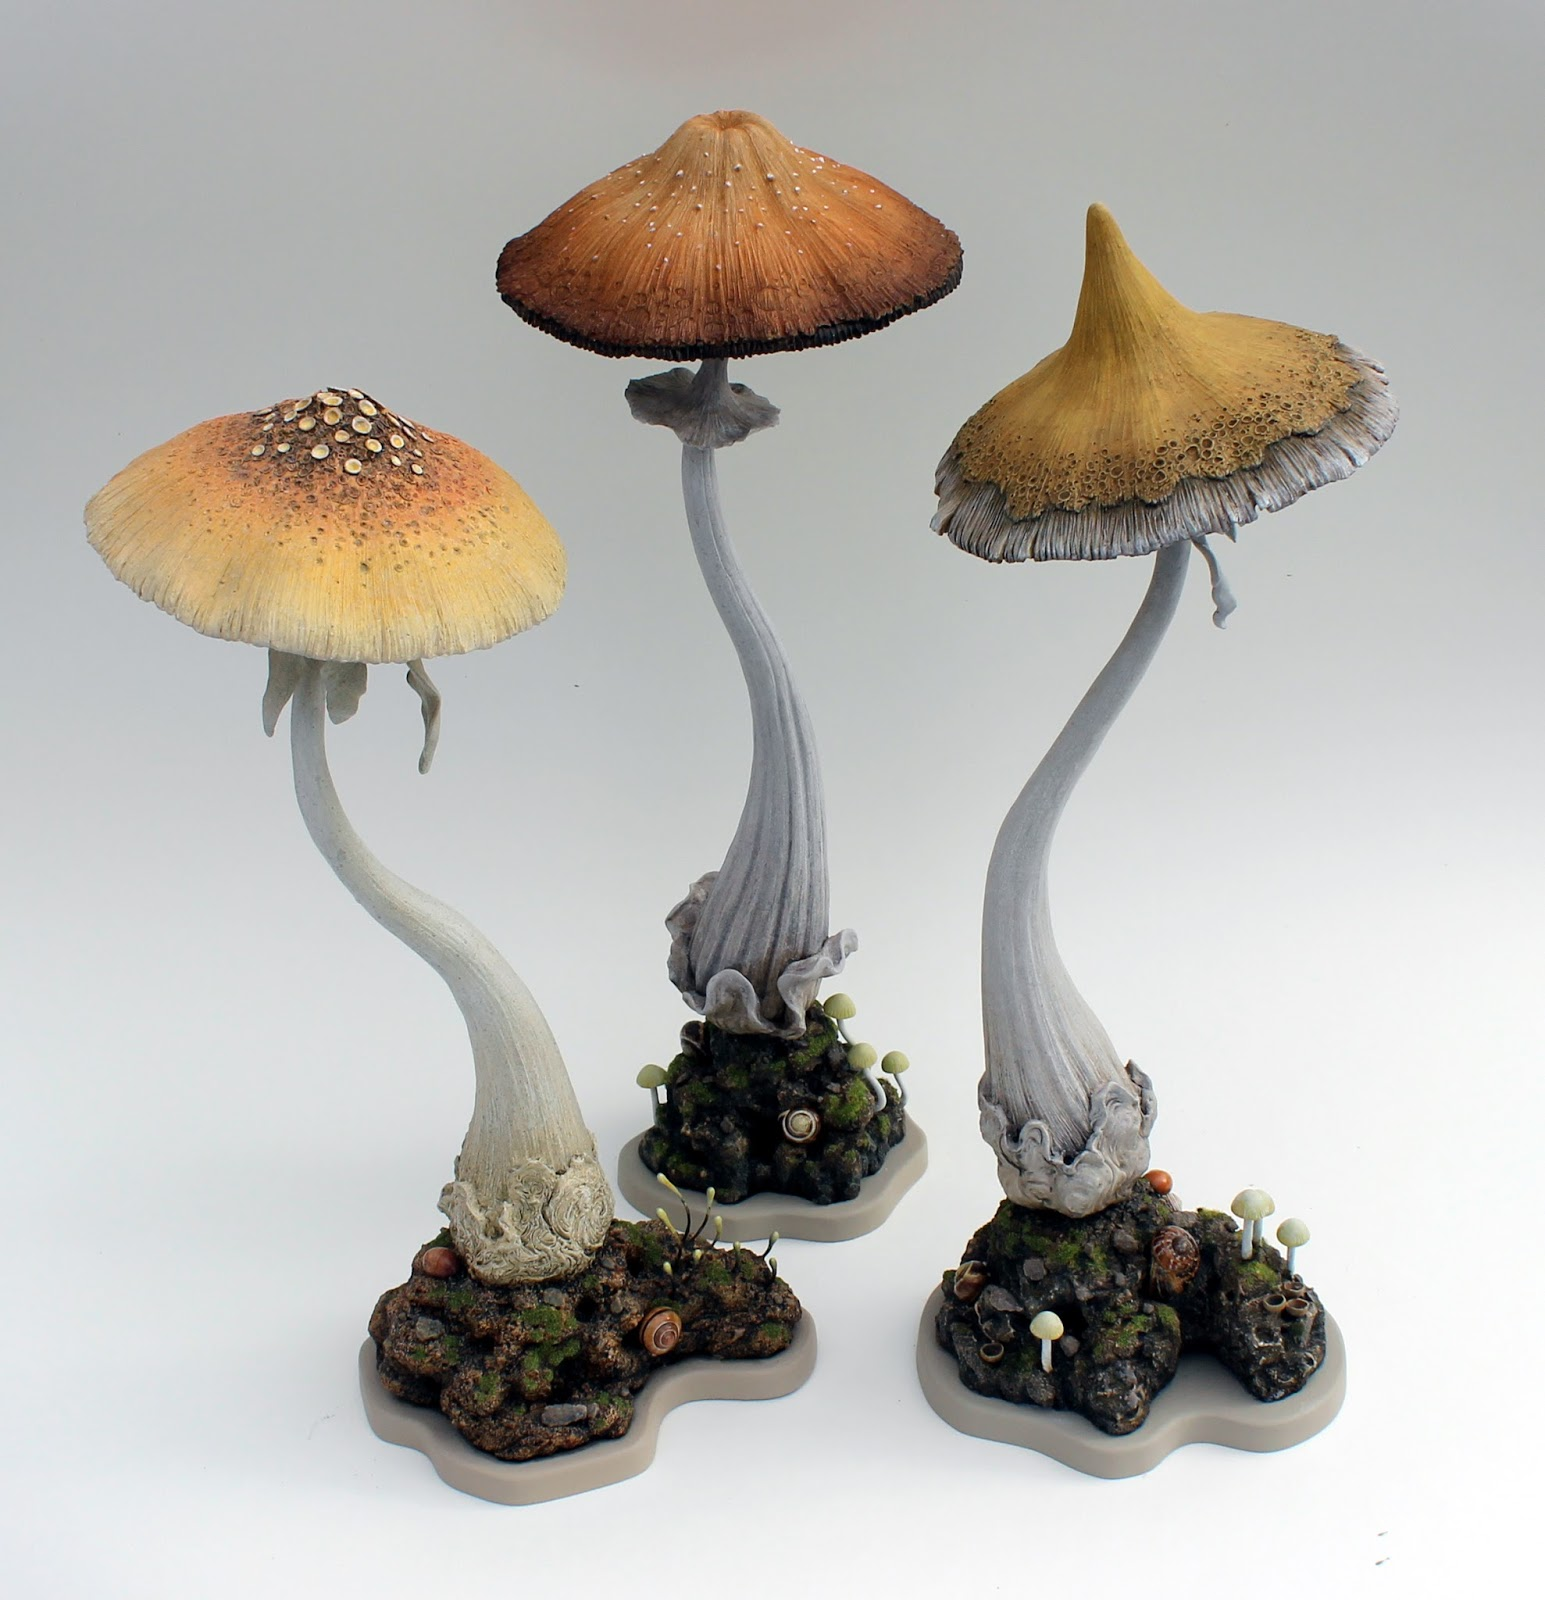 amazoncom magical mushrooms mischievous molds